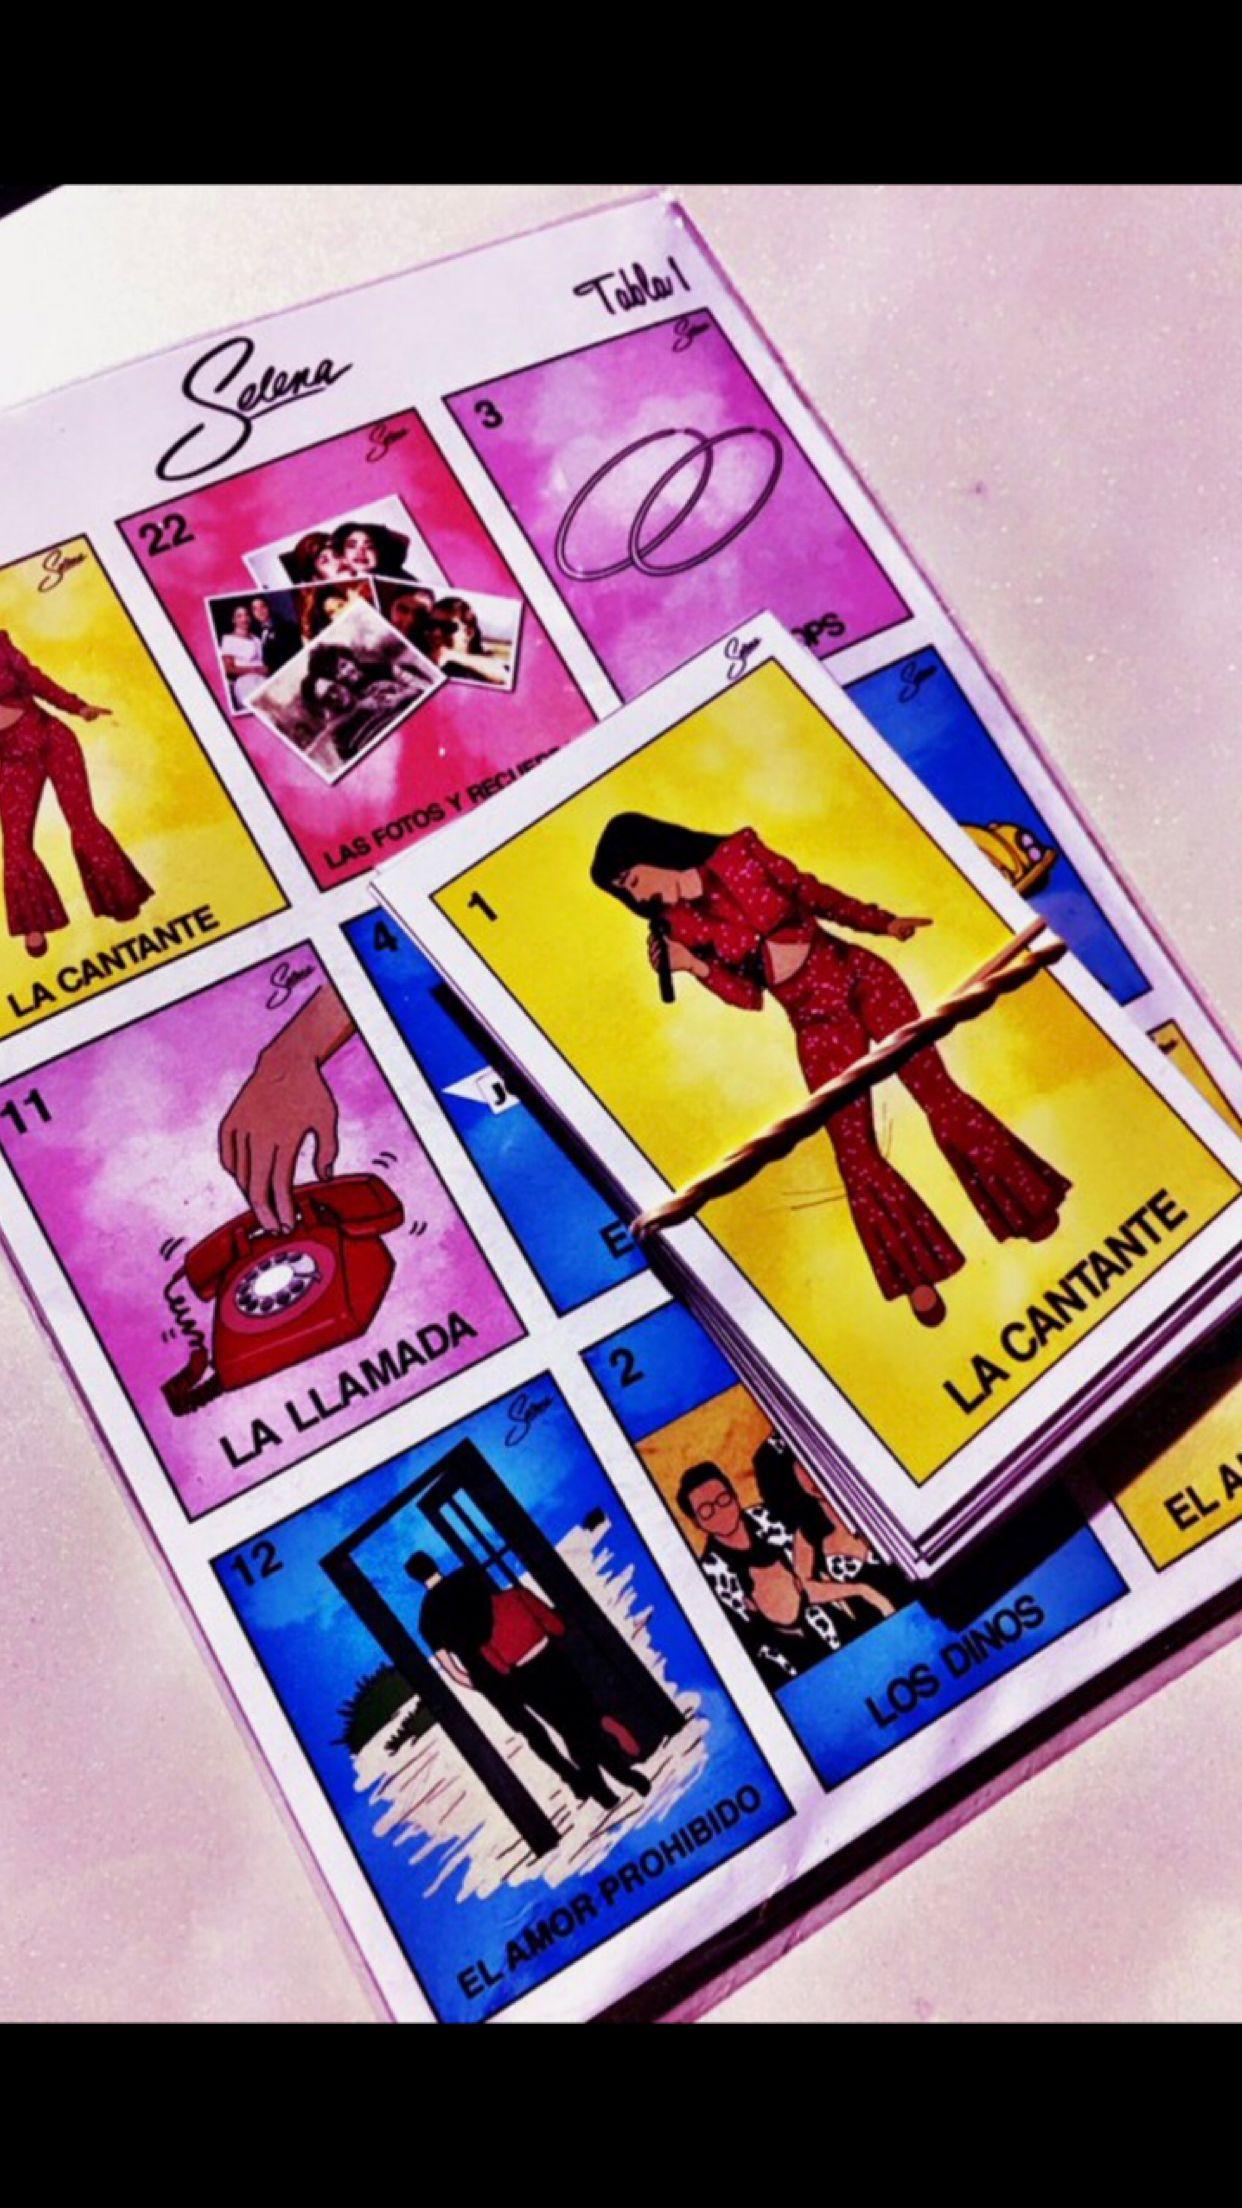 Selena loteria cards Selena, Loteria cards, Selena